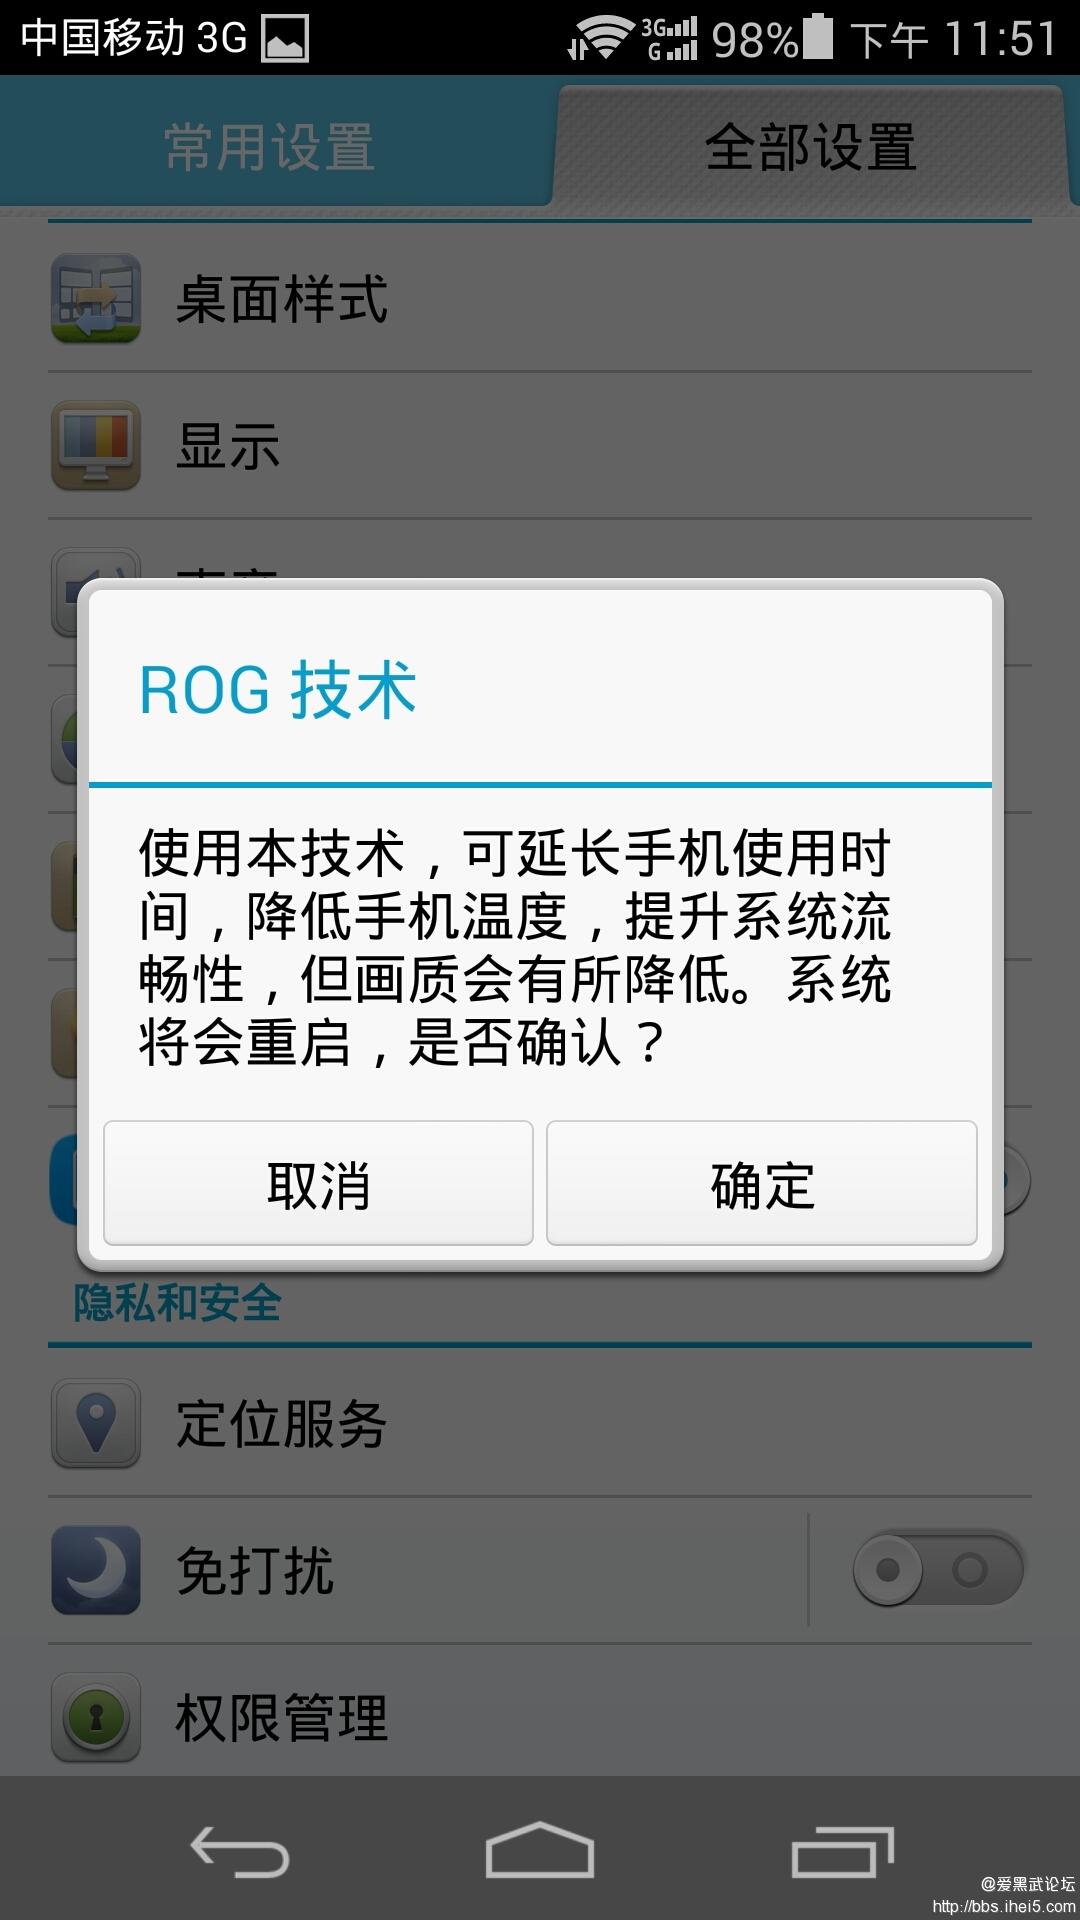 Screenshot_2014-07-21-23-51-36.jpeg